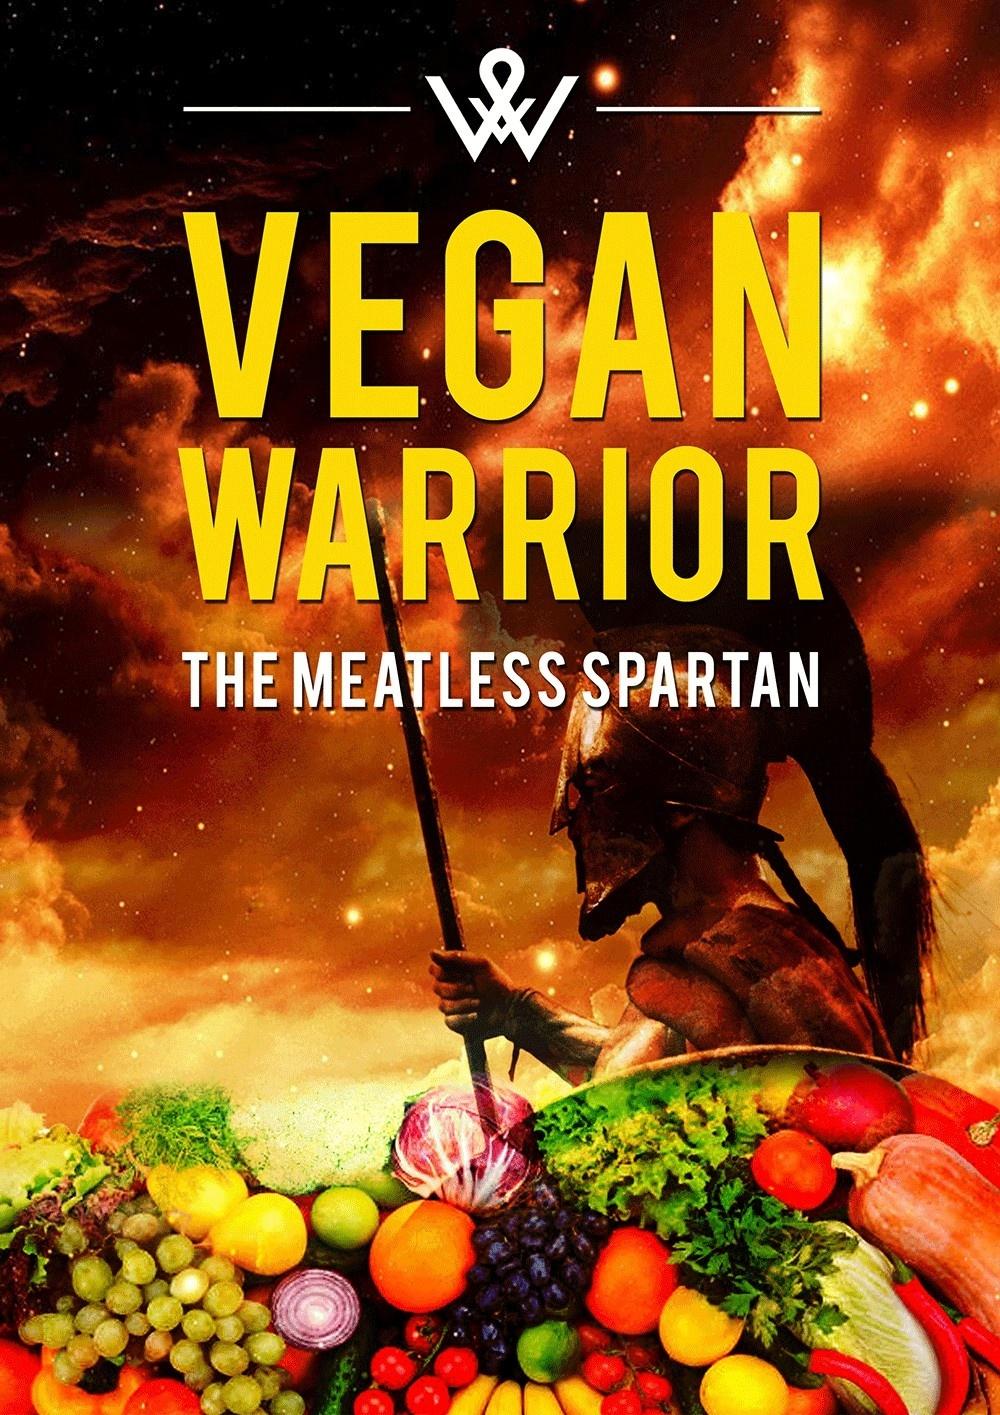 Box Vegan Warrior The Meat Less Spartan in Audio, Video, Ebook